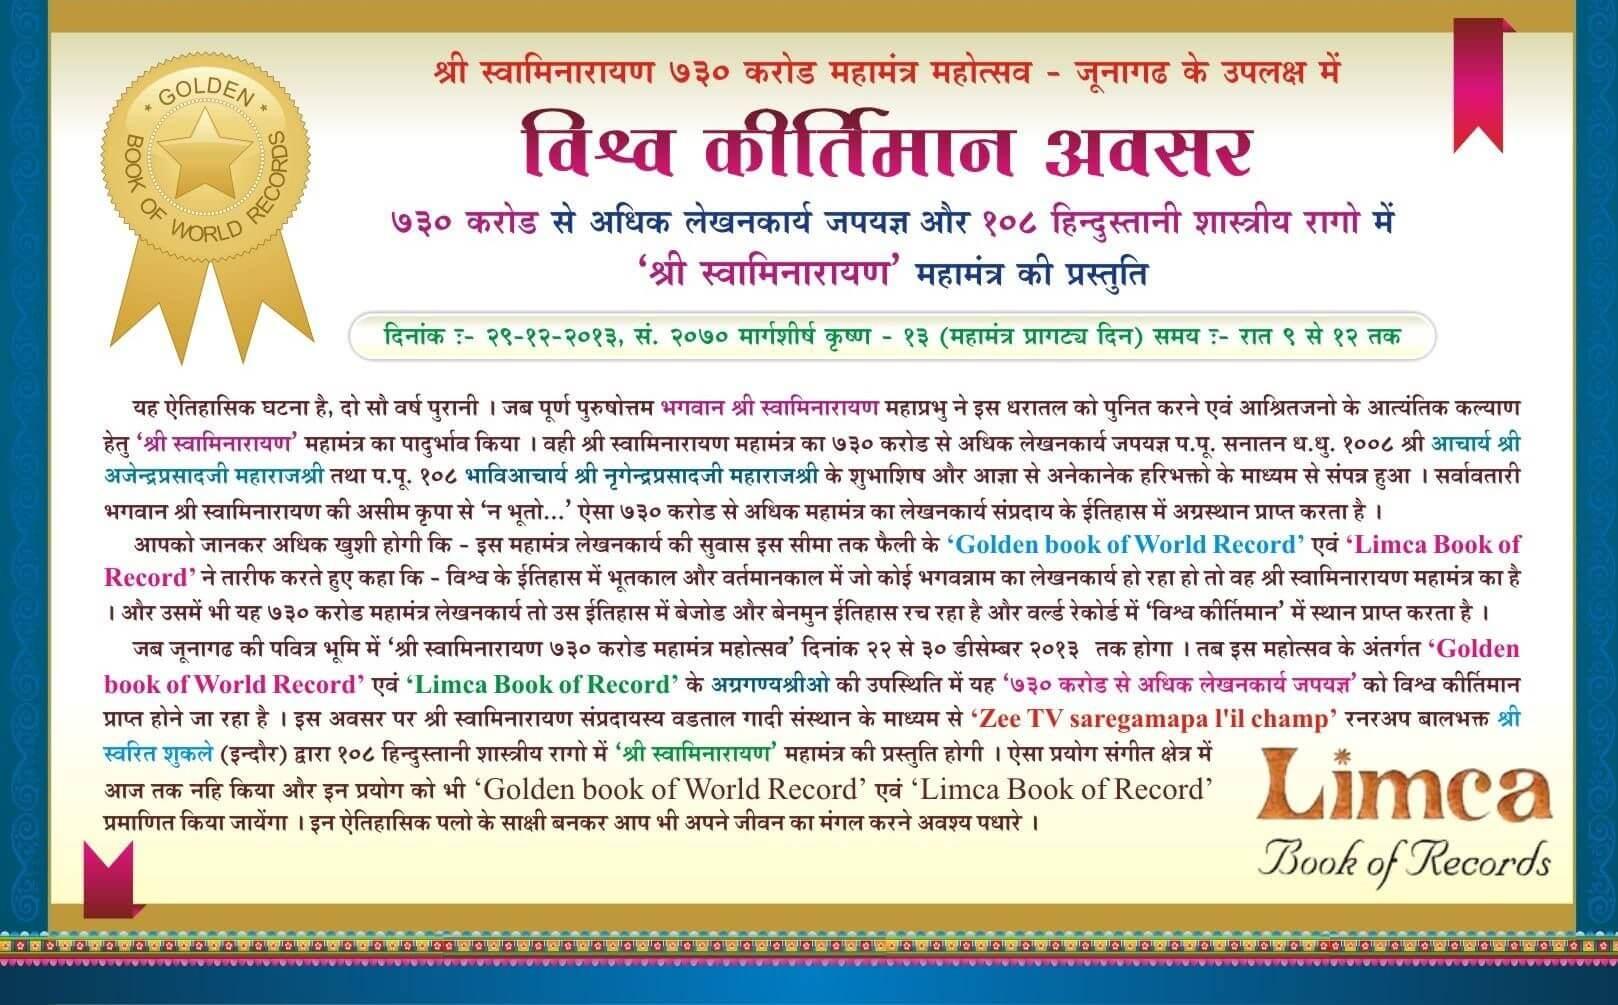 730 Crore Shree Swaminarayan Mahamantra Lekhan and Mahotsav to be written in Limca Book of records and Golden Book of Records.